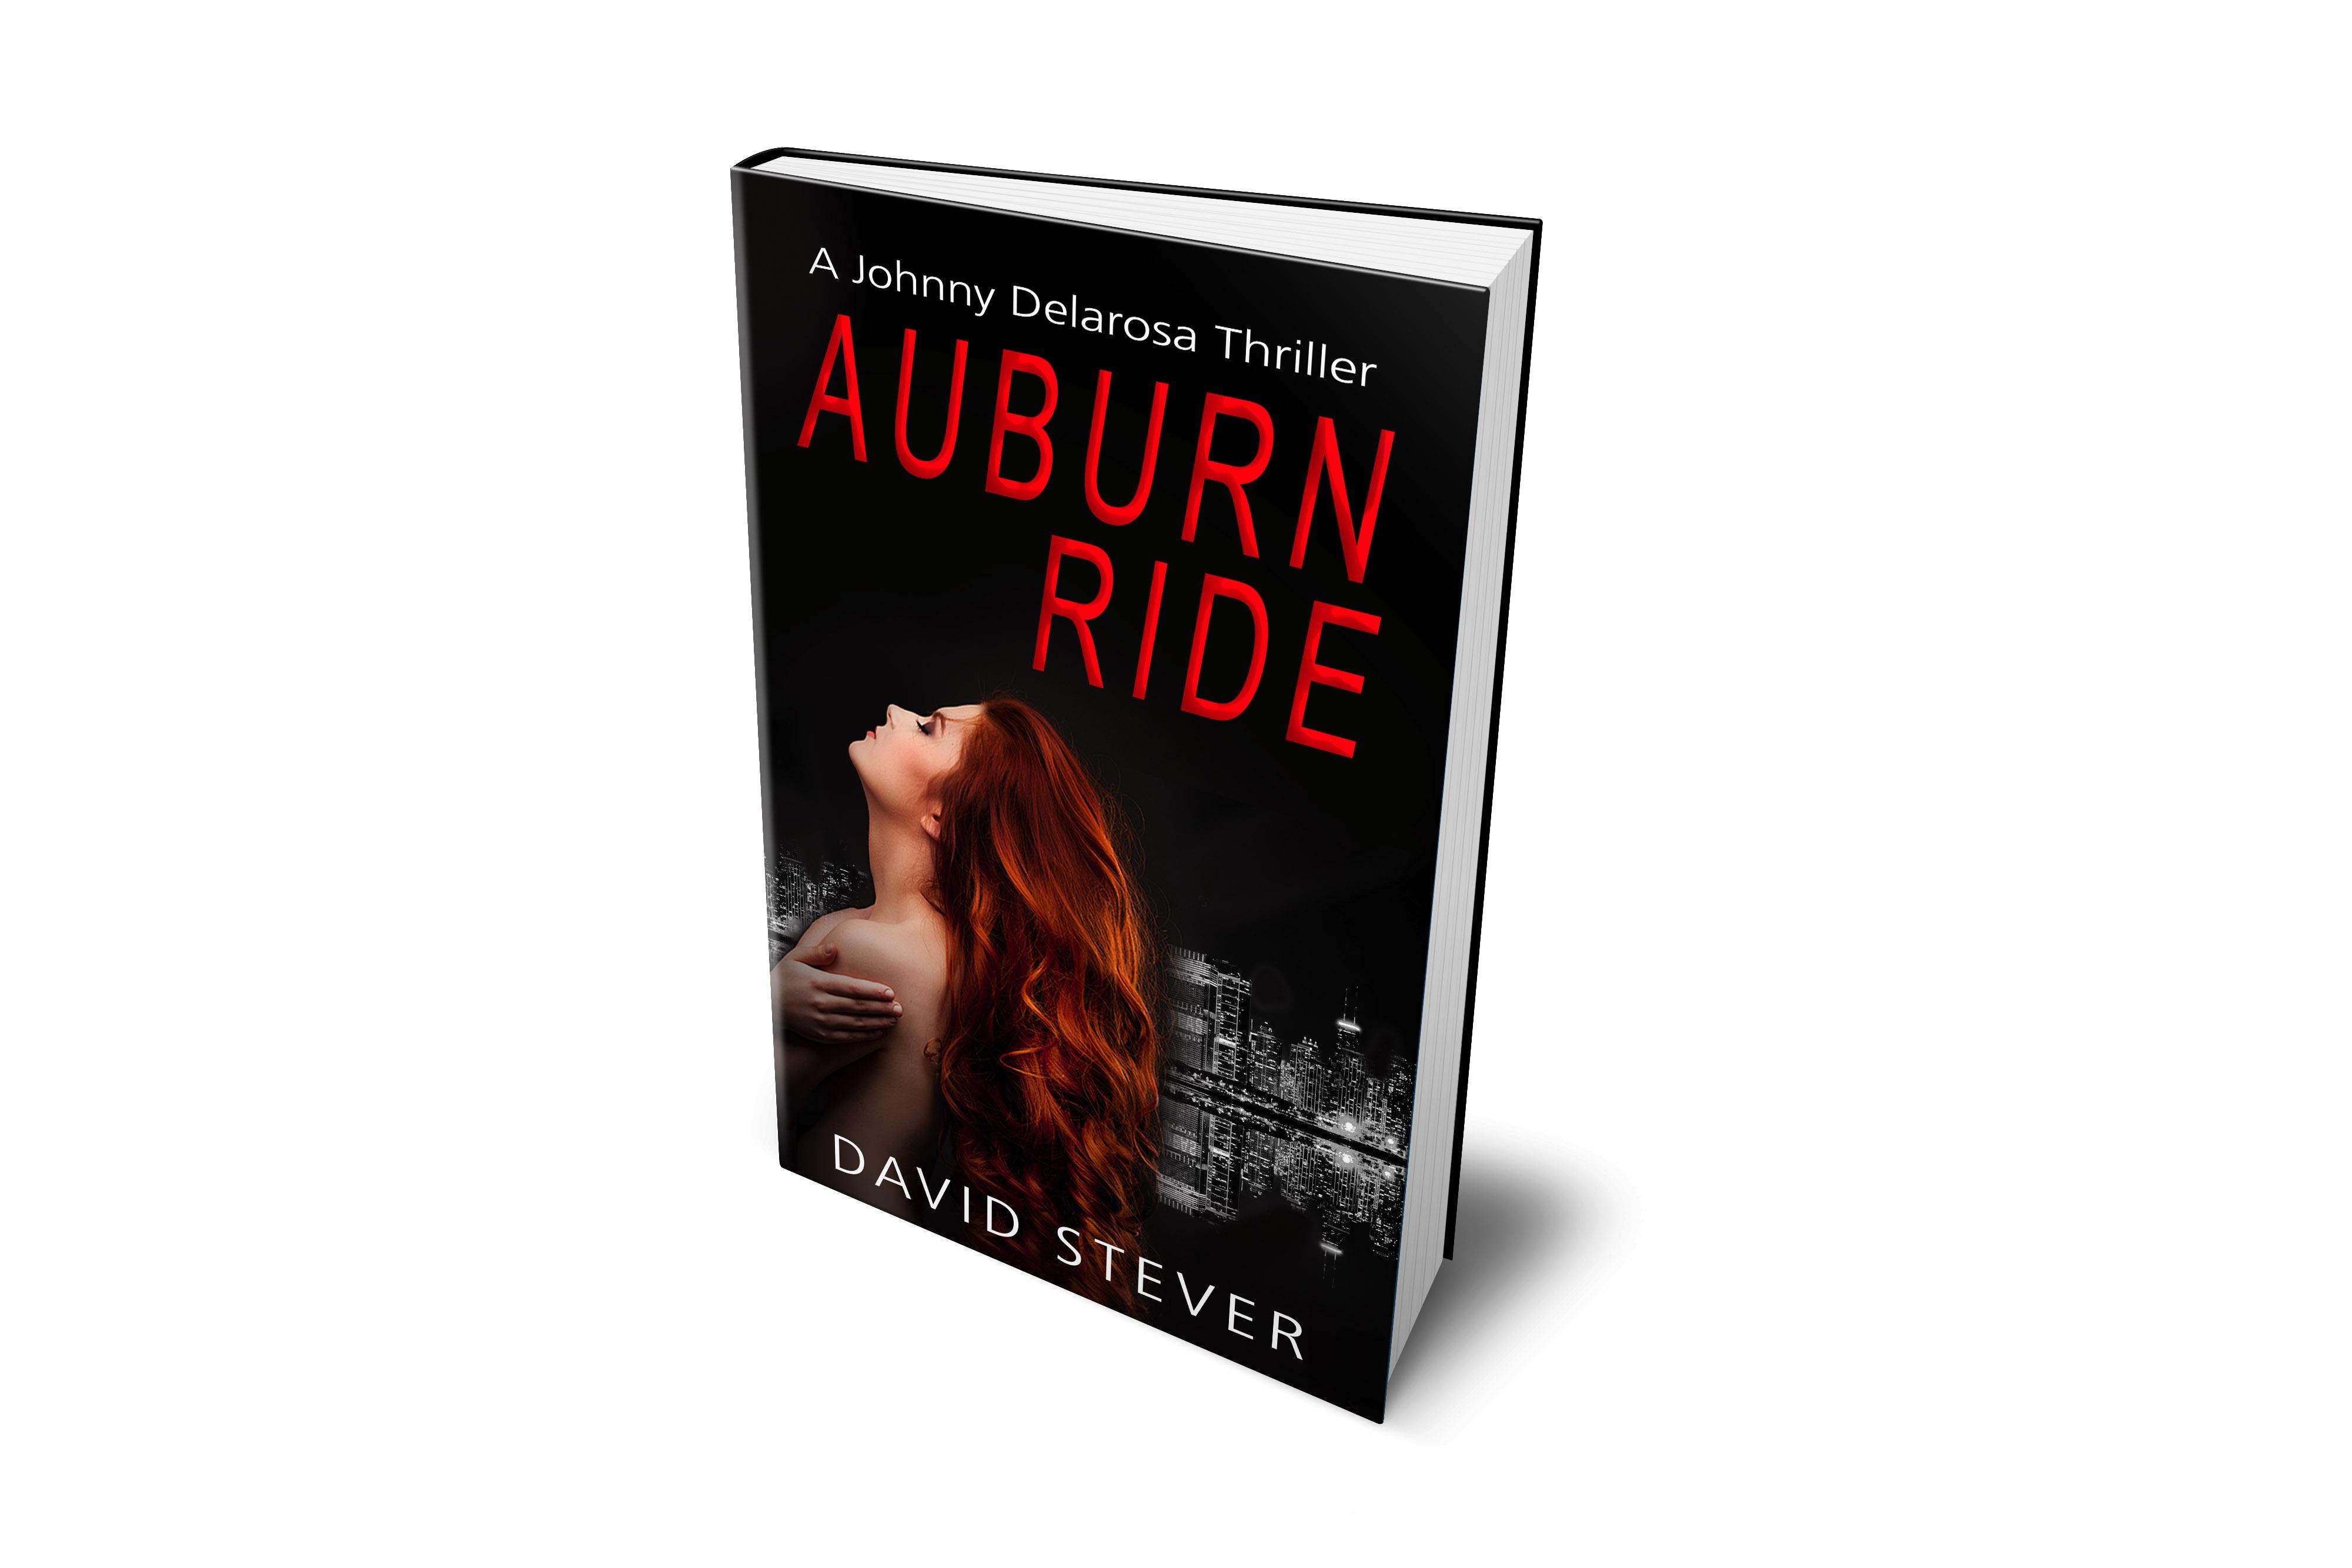 auburn-ride_3d